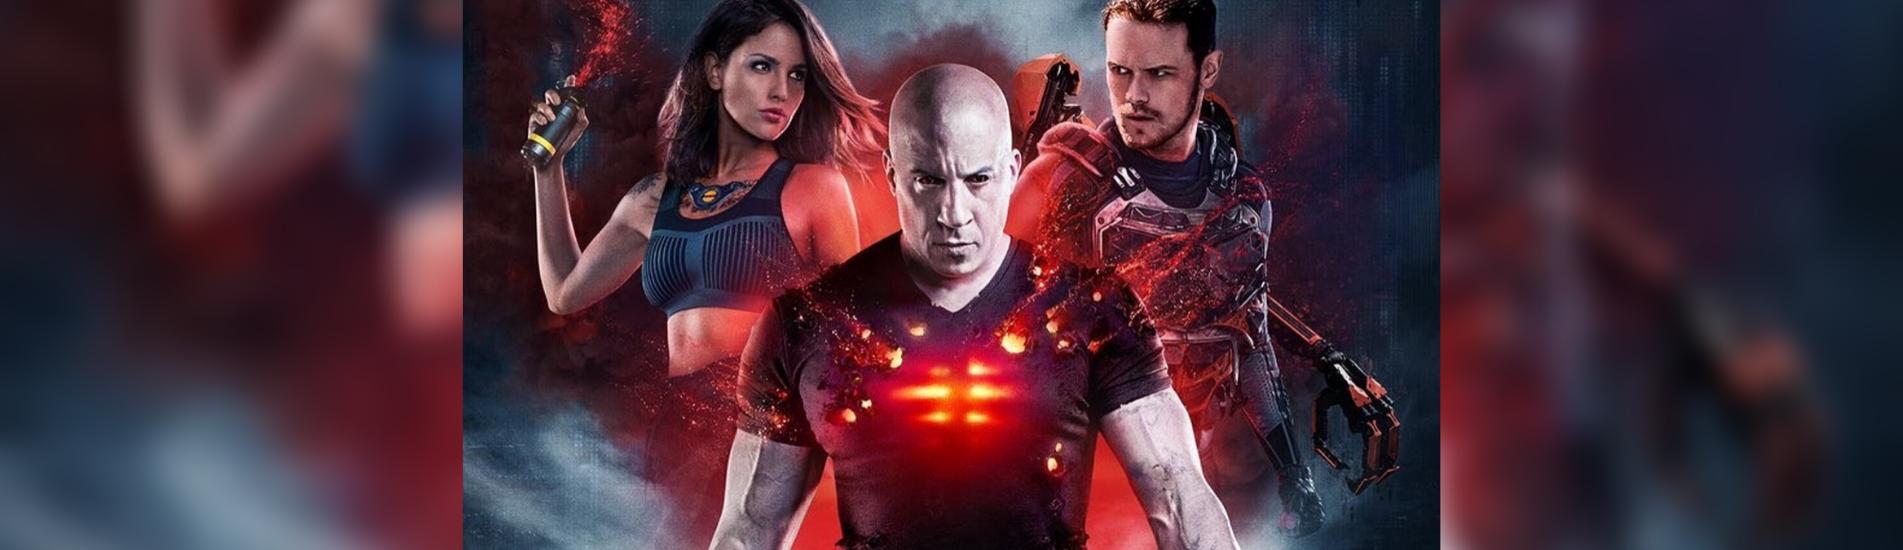 'Bloodshot' estreia nesta quinta na Cineflix do Shopping Sul